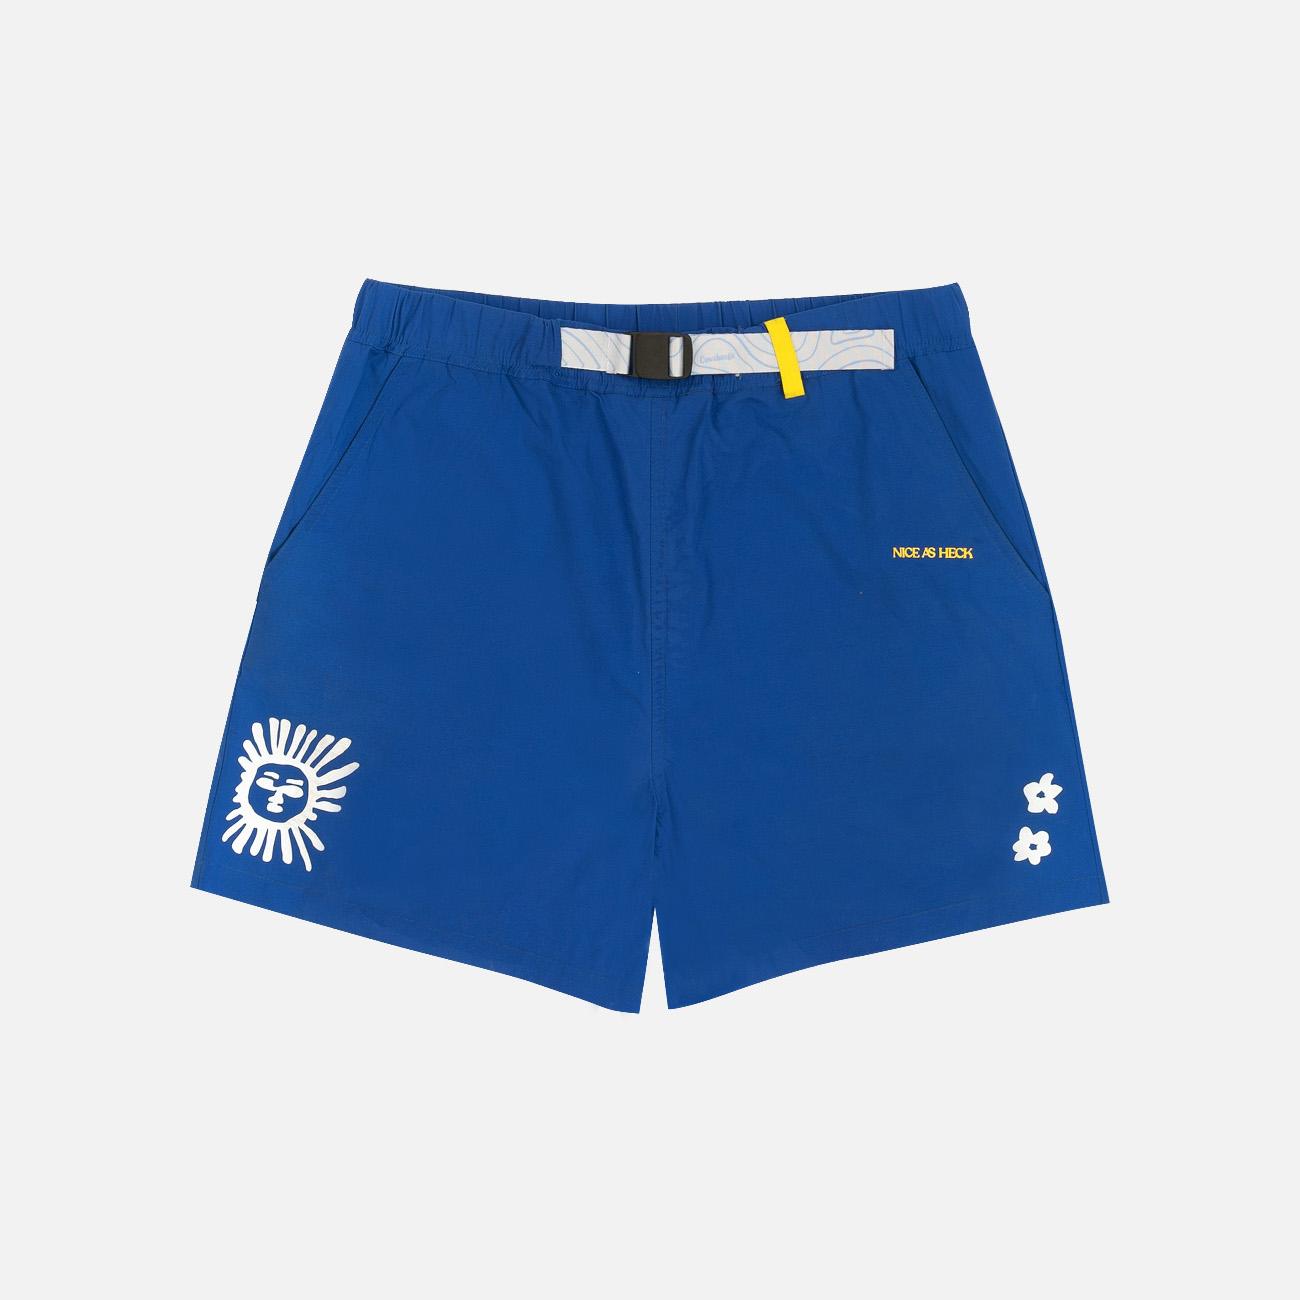 Daytripper Graphic Nylon Shorts | Blue